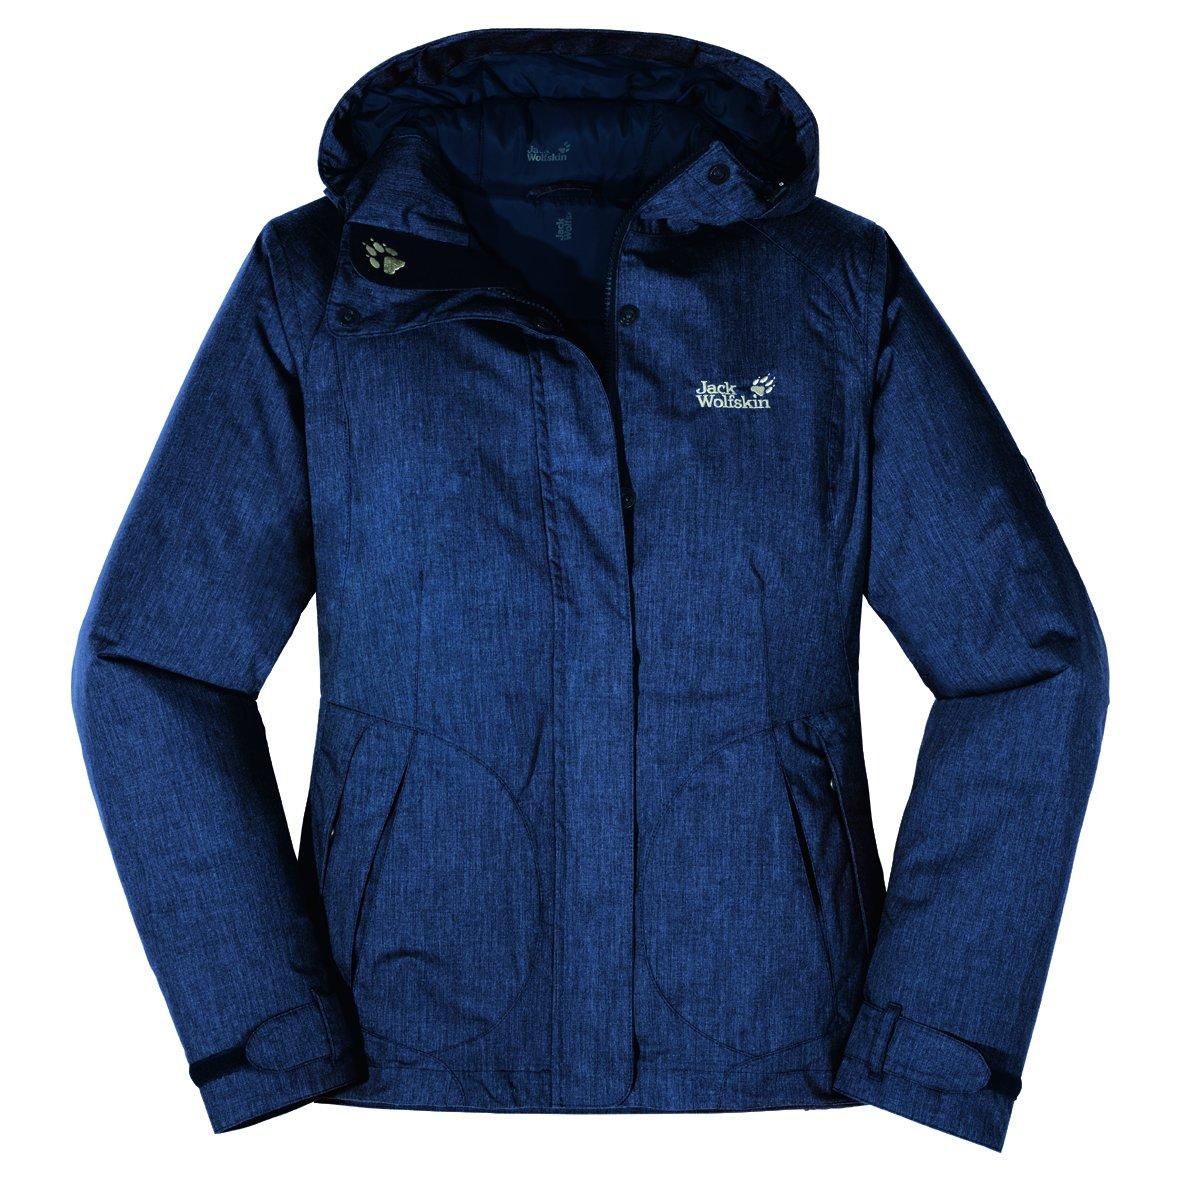 Jack Wolfskin Damen Jacke Wave Hill Jacket Women online kaufen